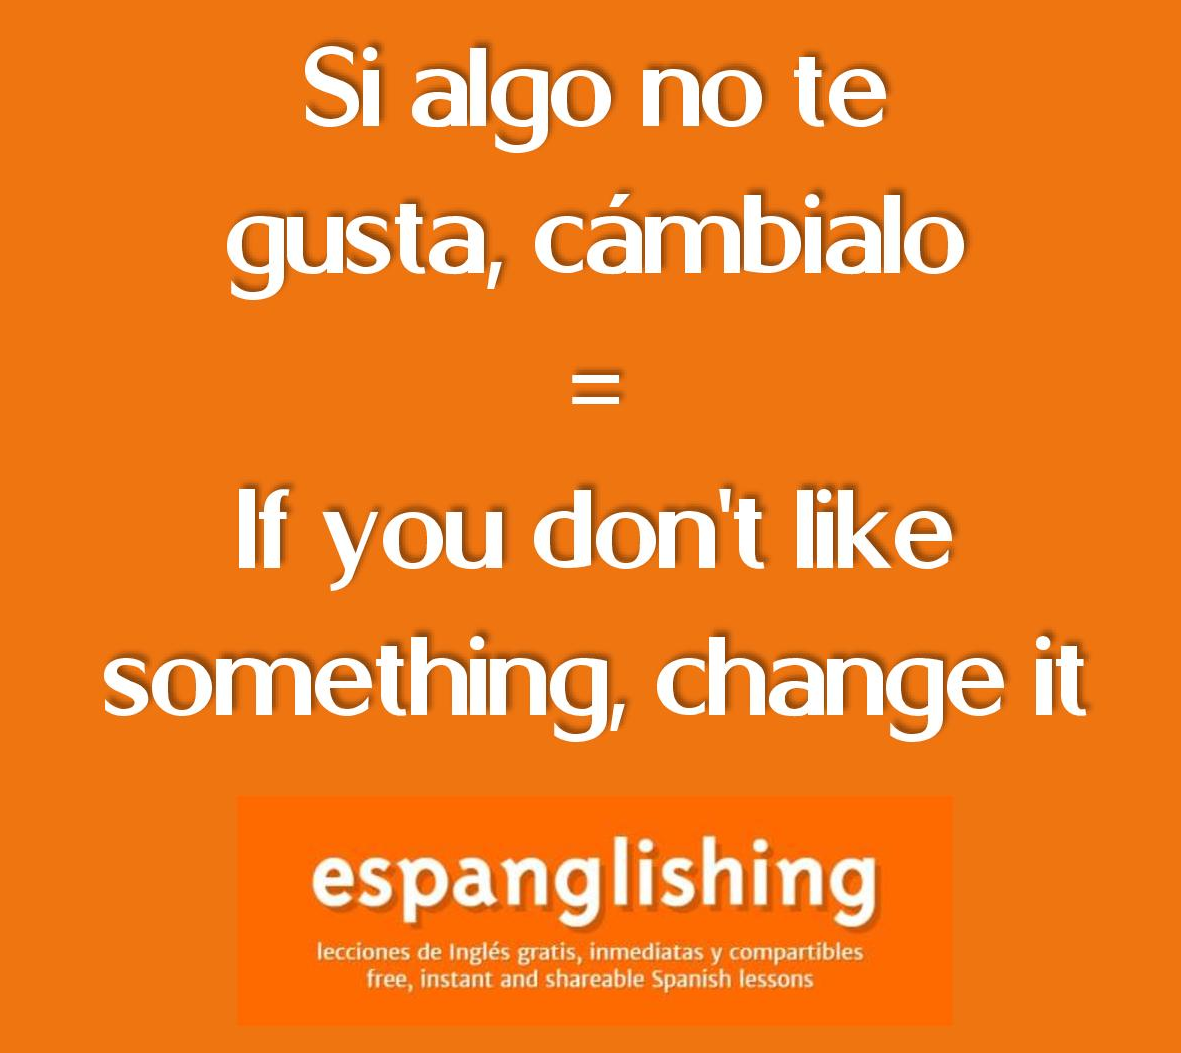 Si algo no te gusta, cámbialo = If you don't like something, change it